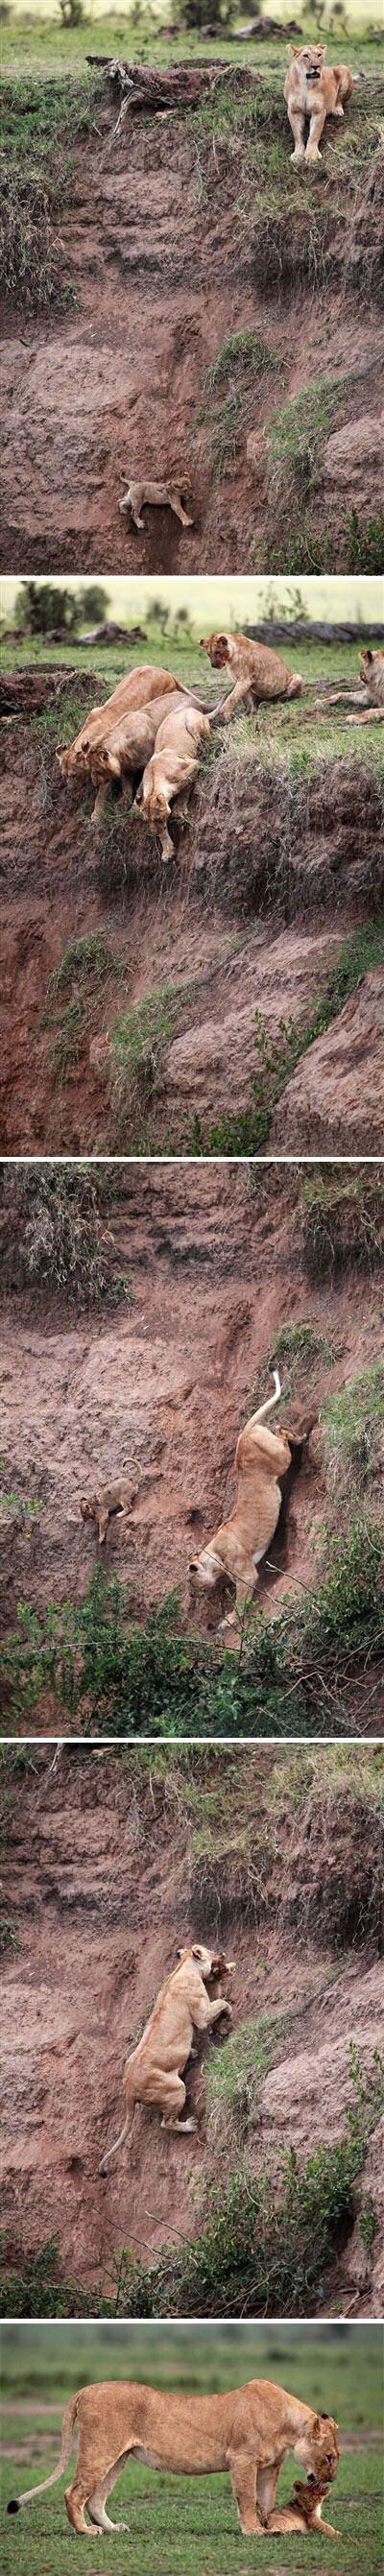 A Mother's Love   Photos from MSNBC via Animal Tracks Photos by Jean-Francois Lagrot / Sax Rohmer Ltd